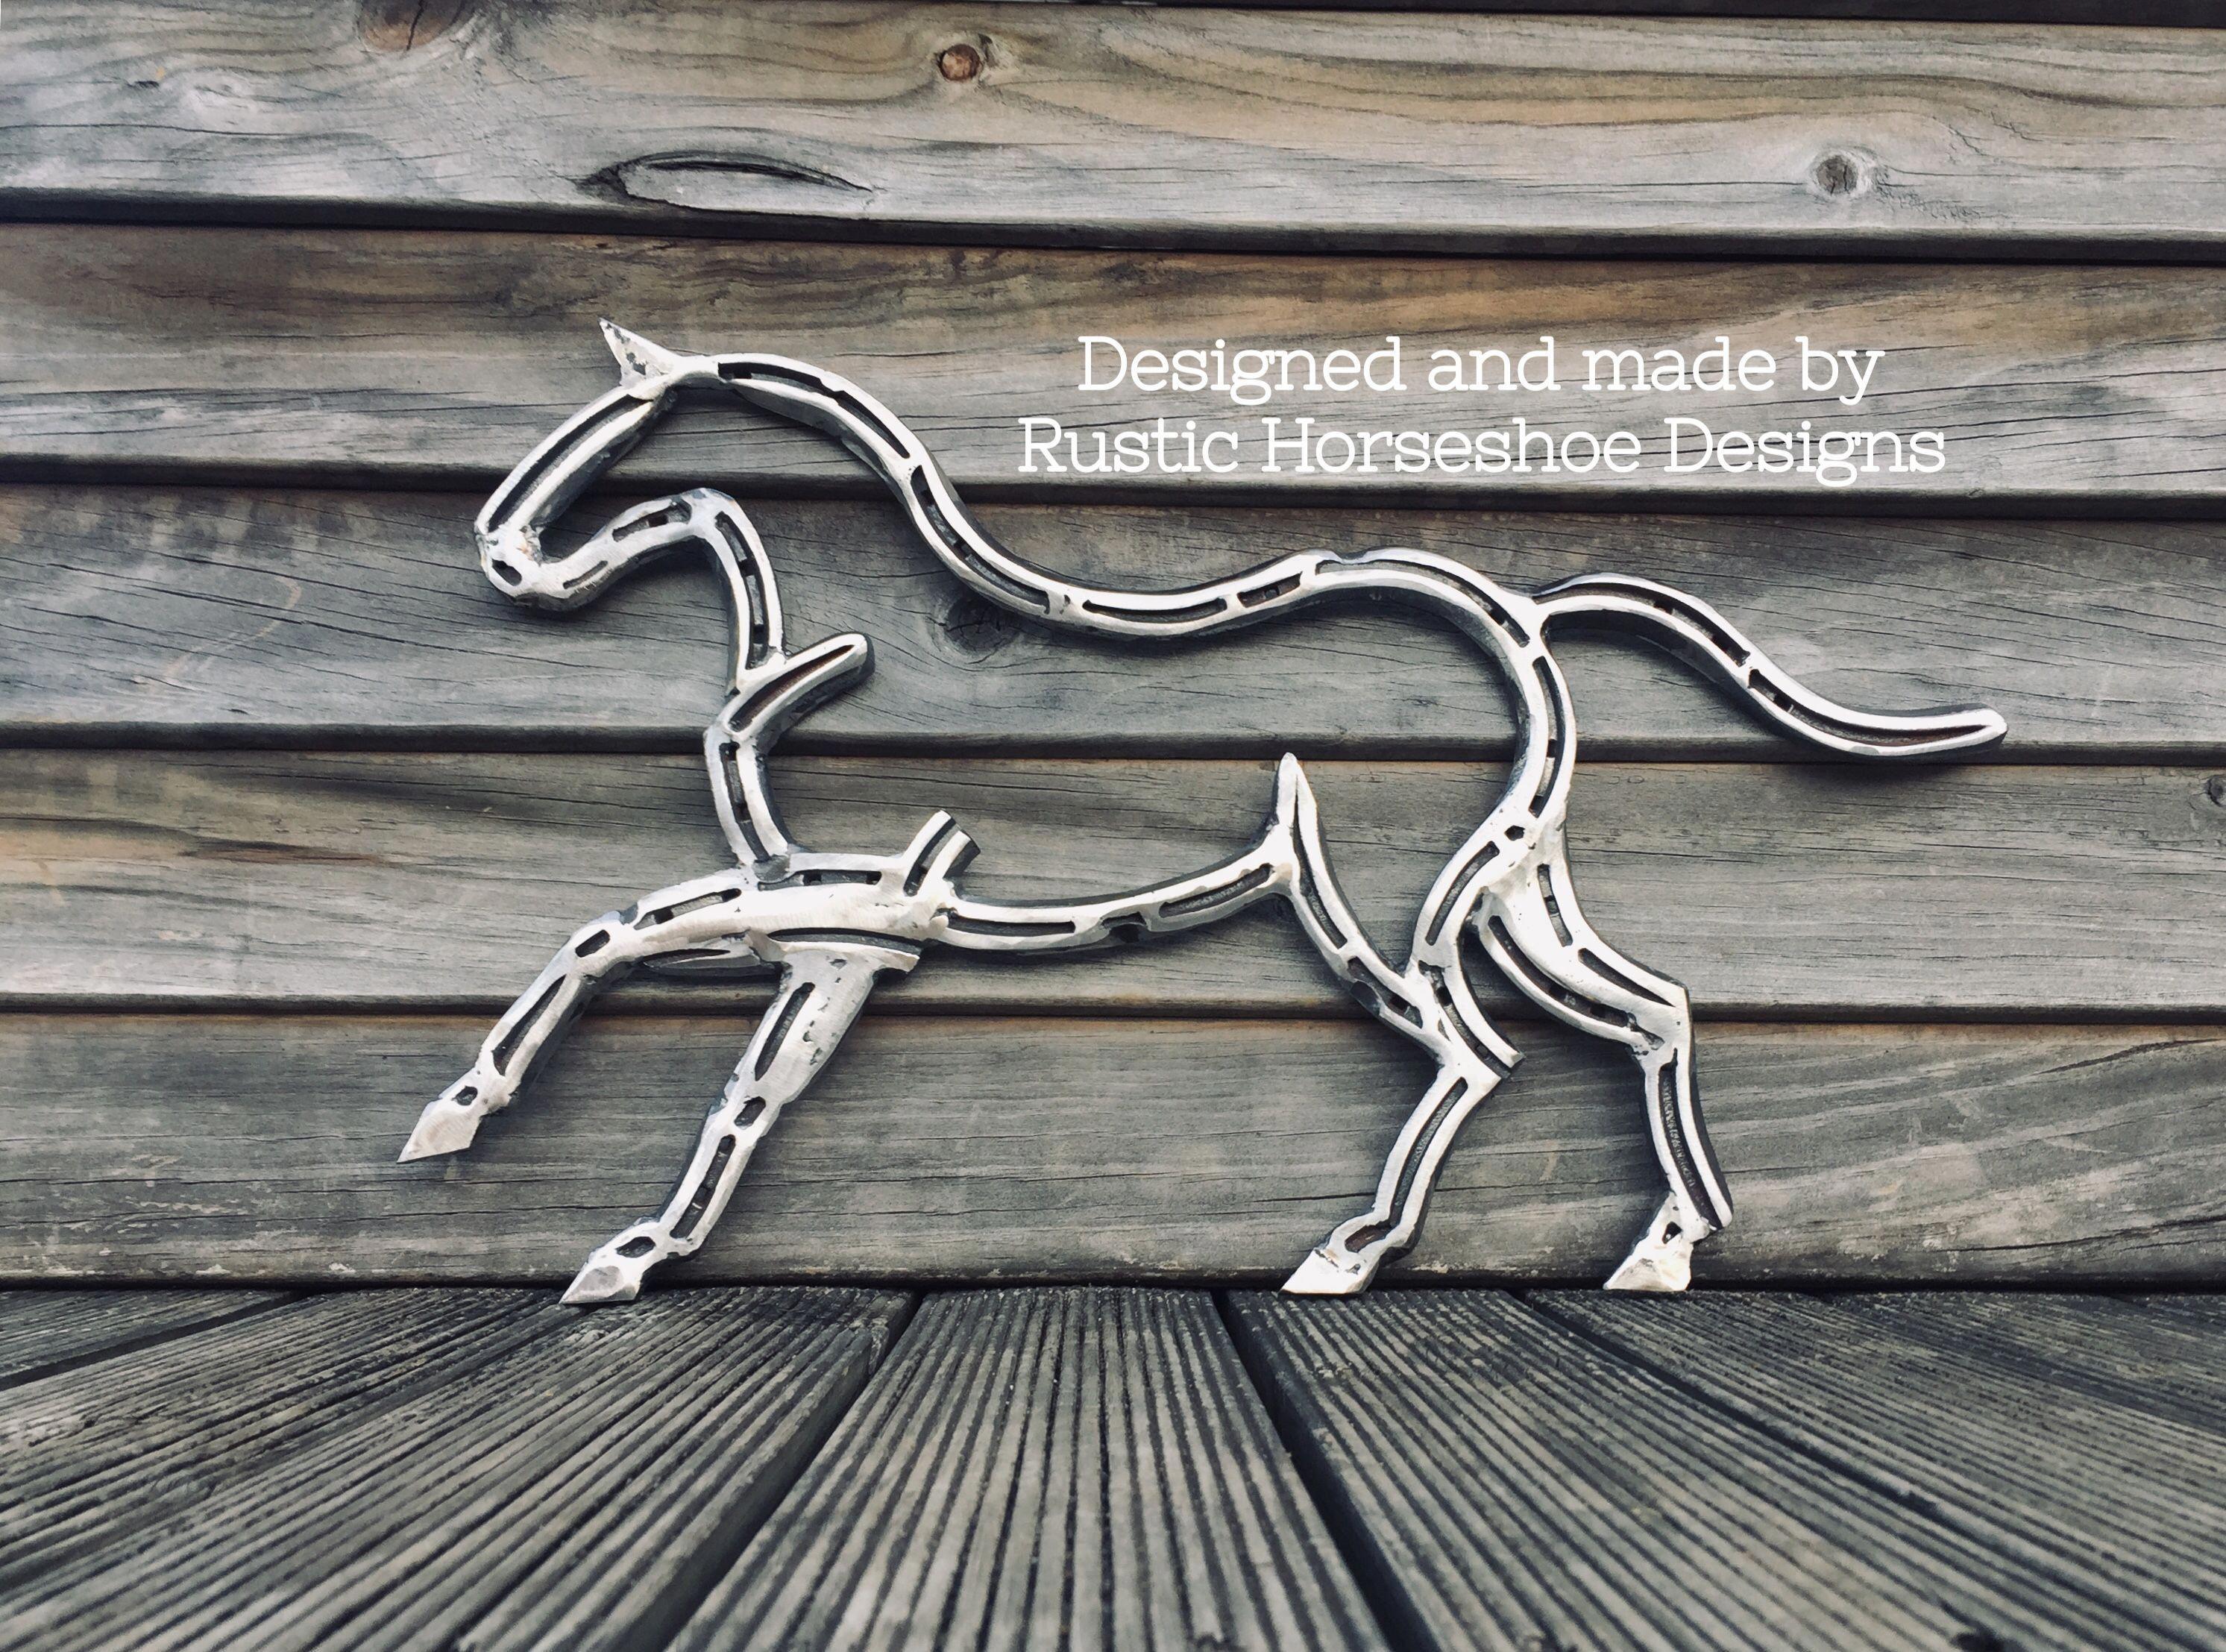 Horseshoe Horse In 2020 Horseshoe Art Welding Art Projects Horseshoe